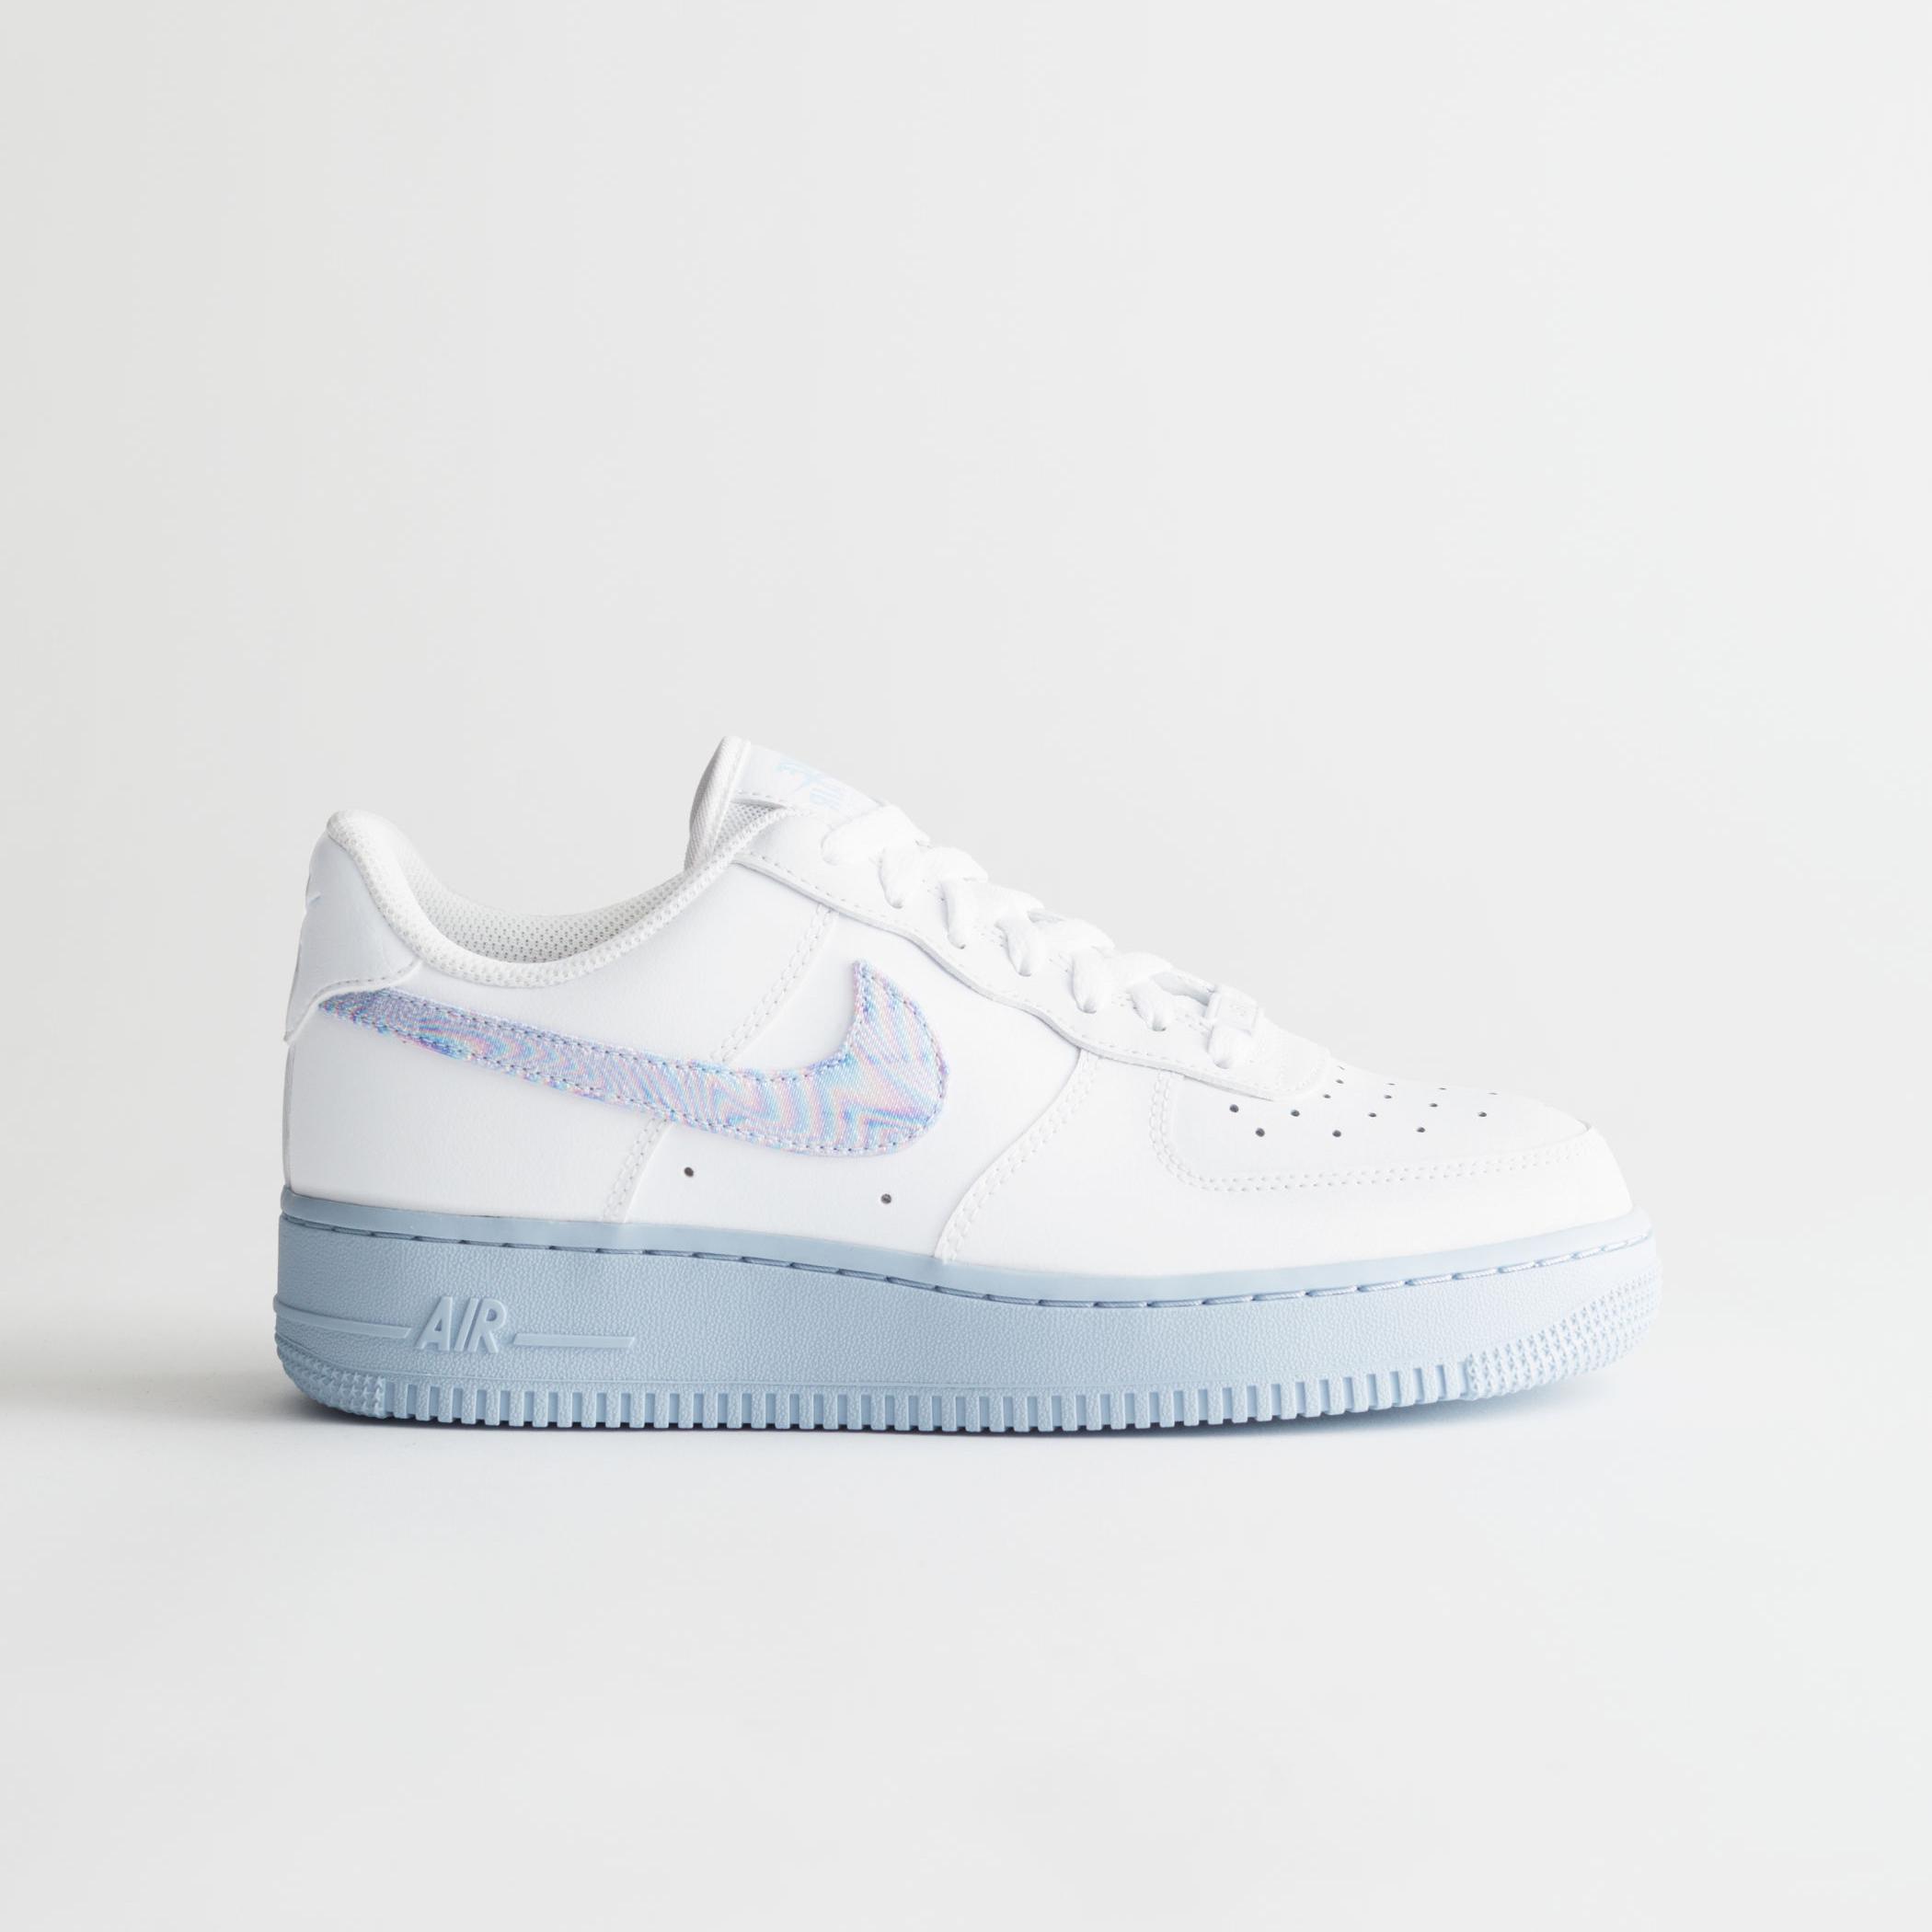 Nike Air Force 1 高帮空军1号